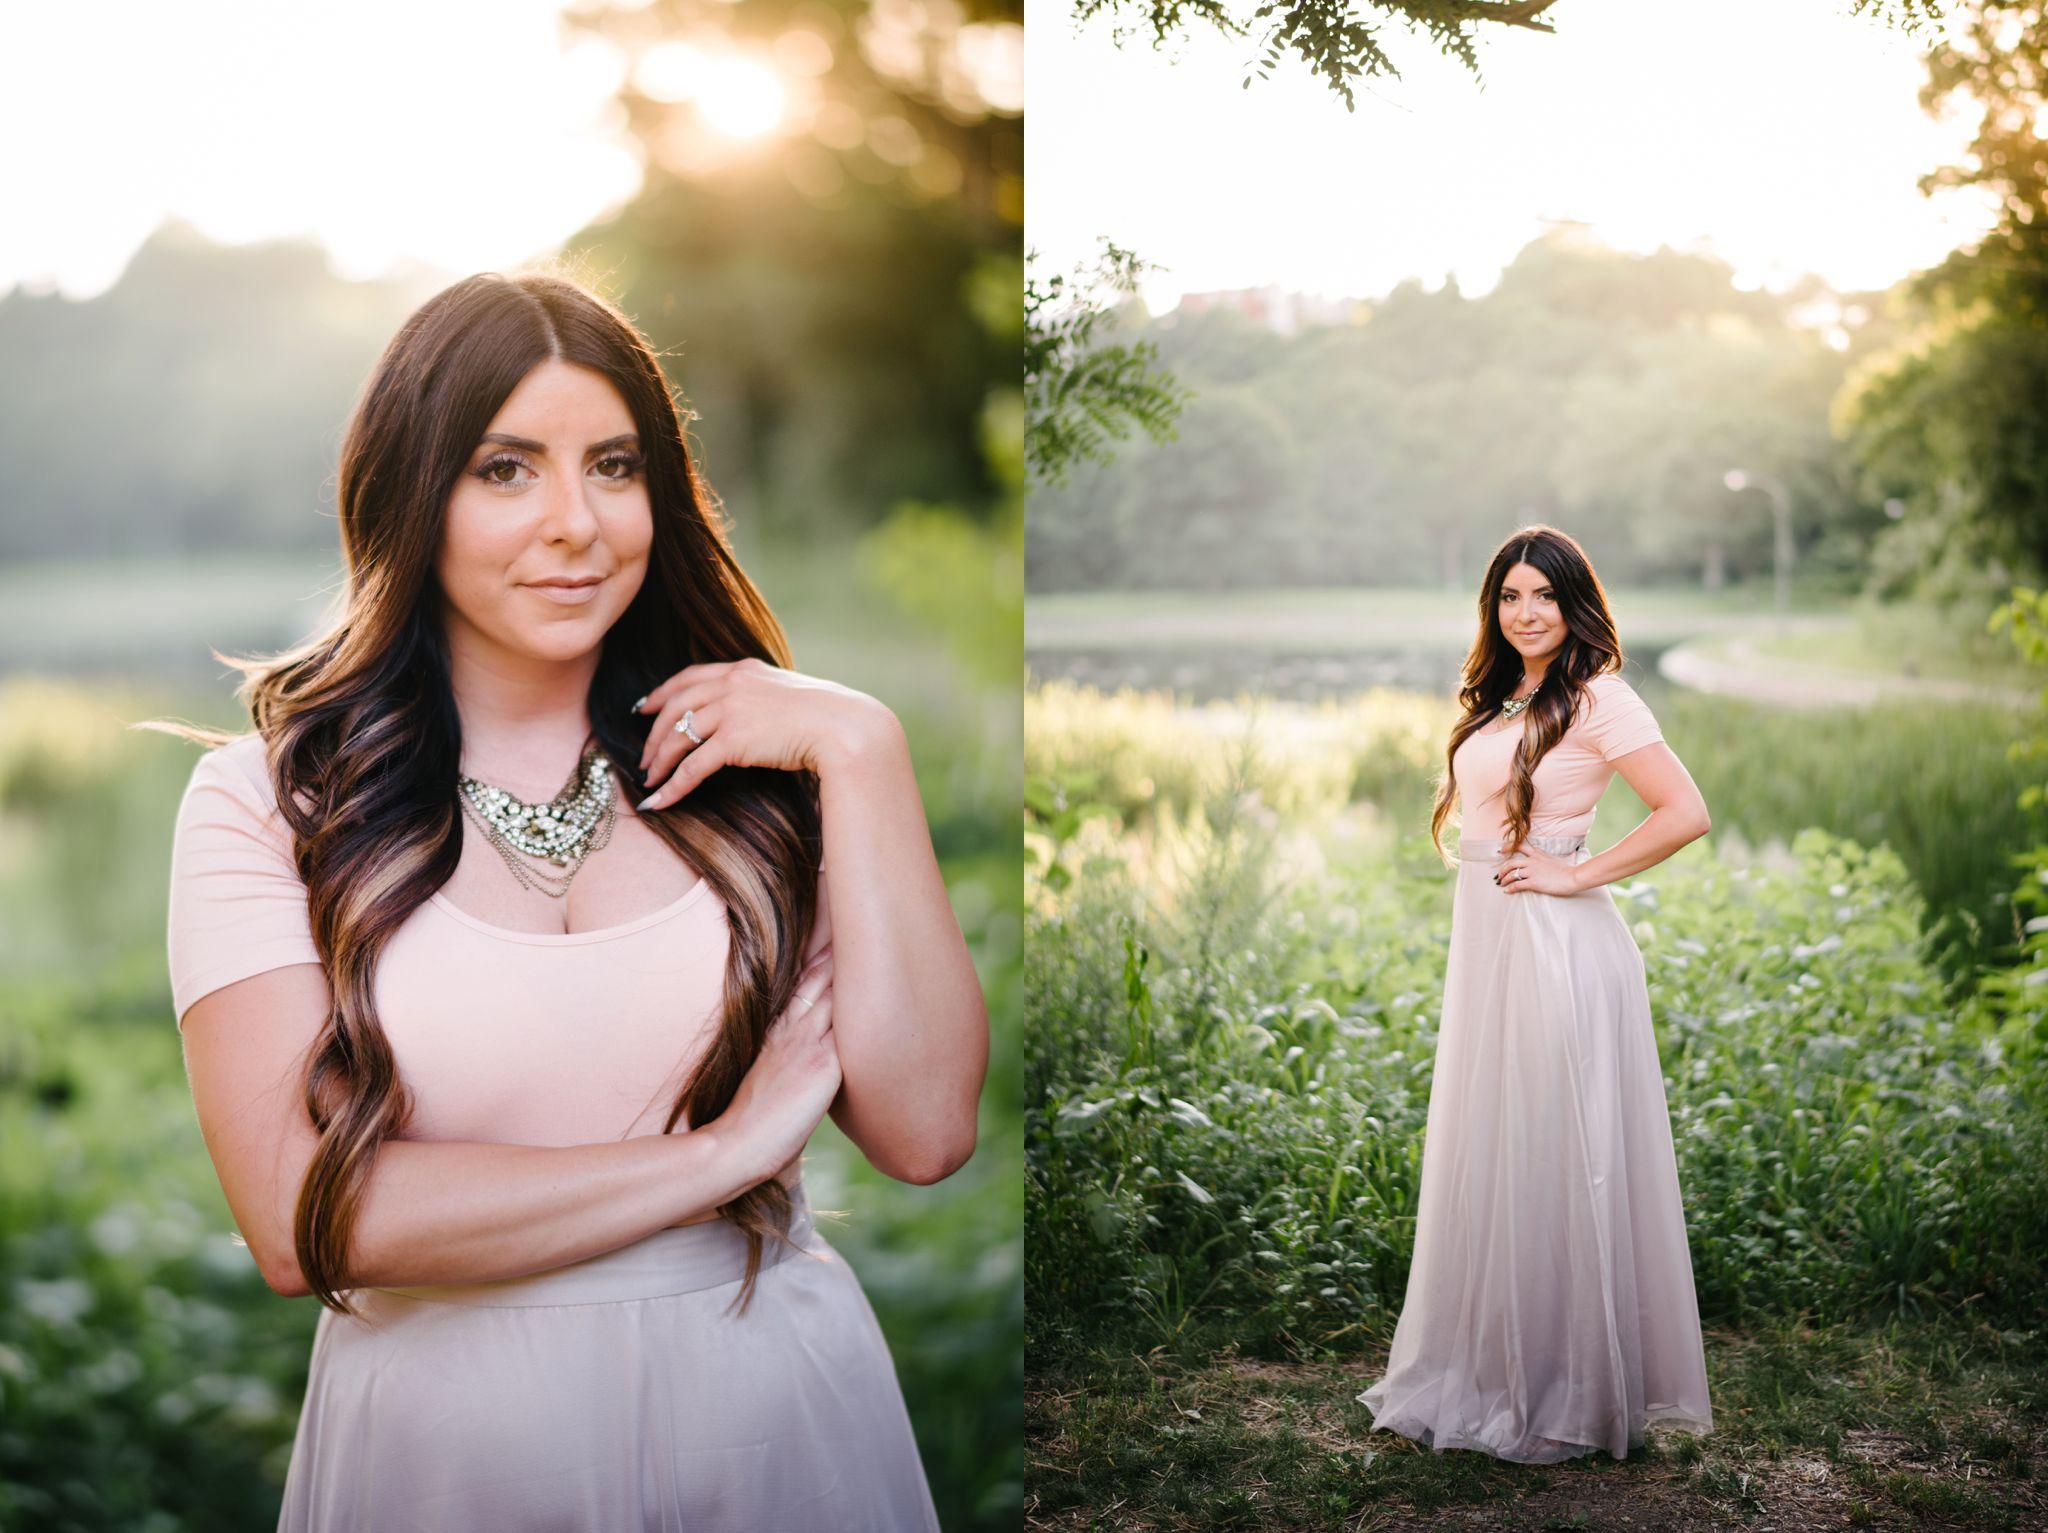 Schenley Park Engagement Pittsburgh Rachel Rossetti Photography_0054.jpg